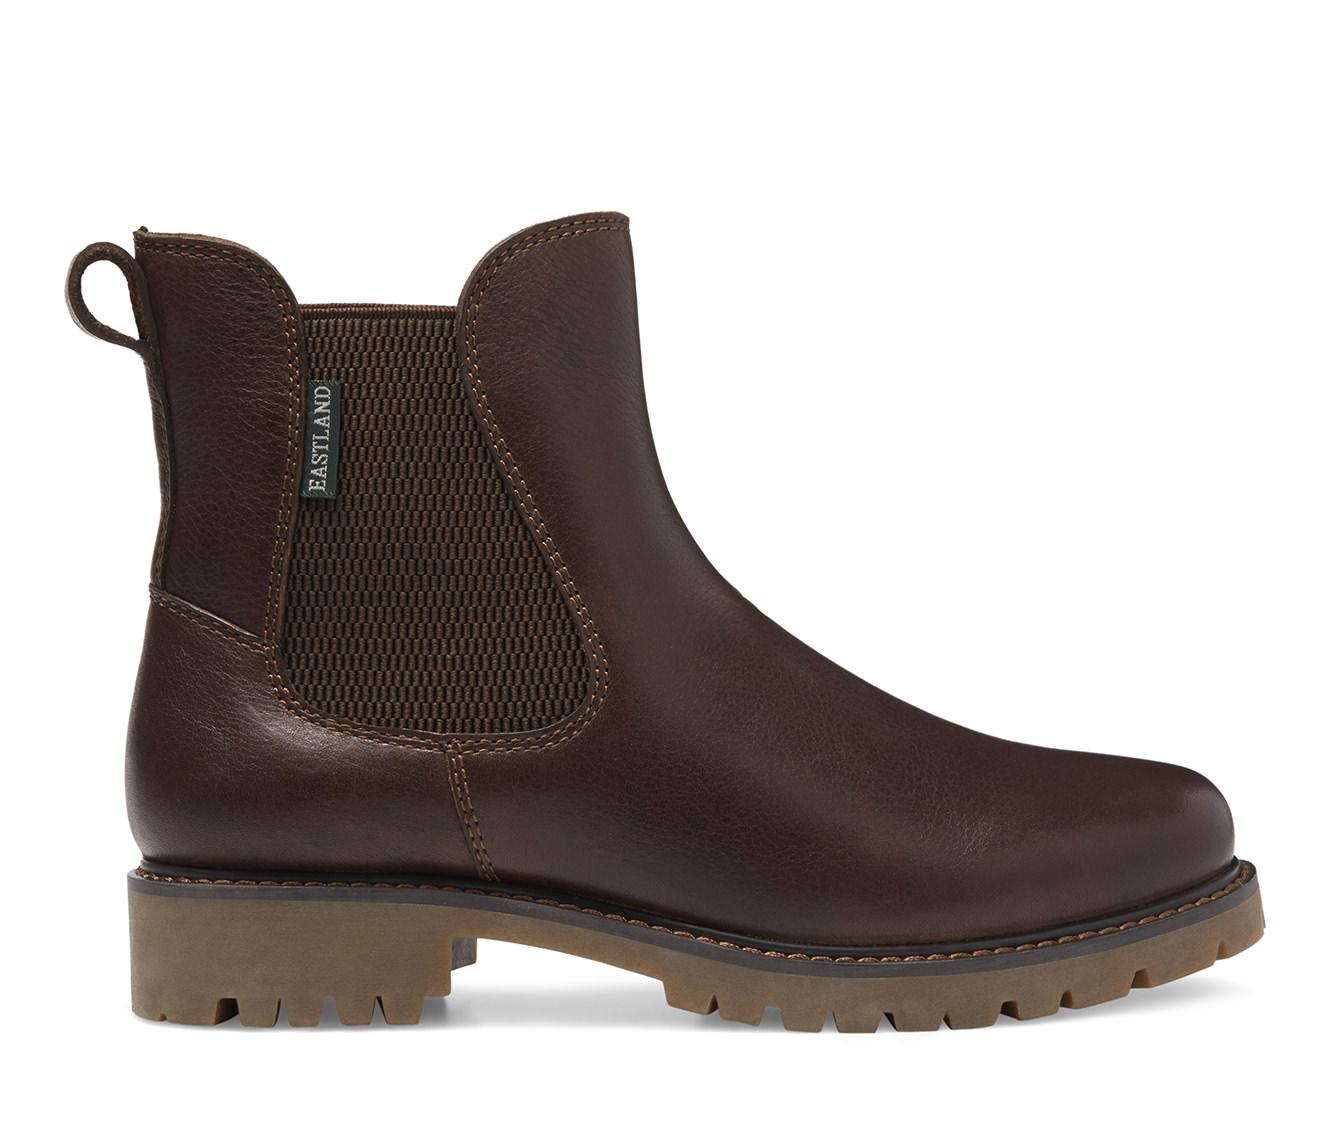 Eastland Ida Women's Boots (Brown - Leather)